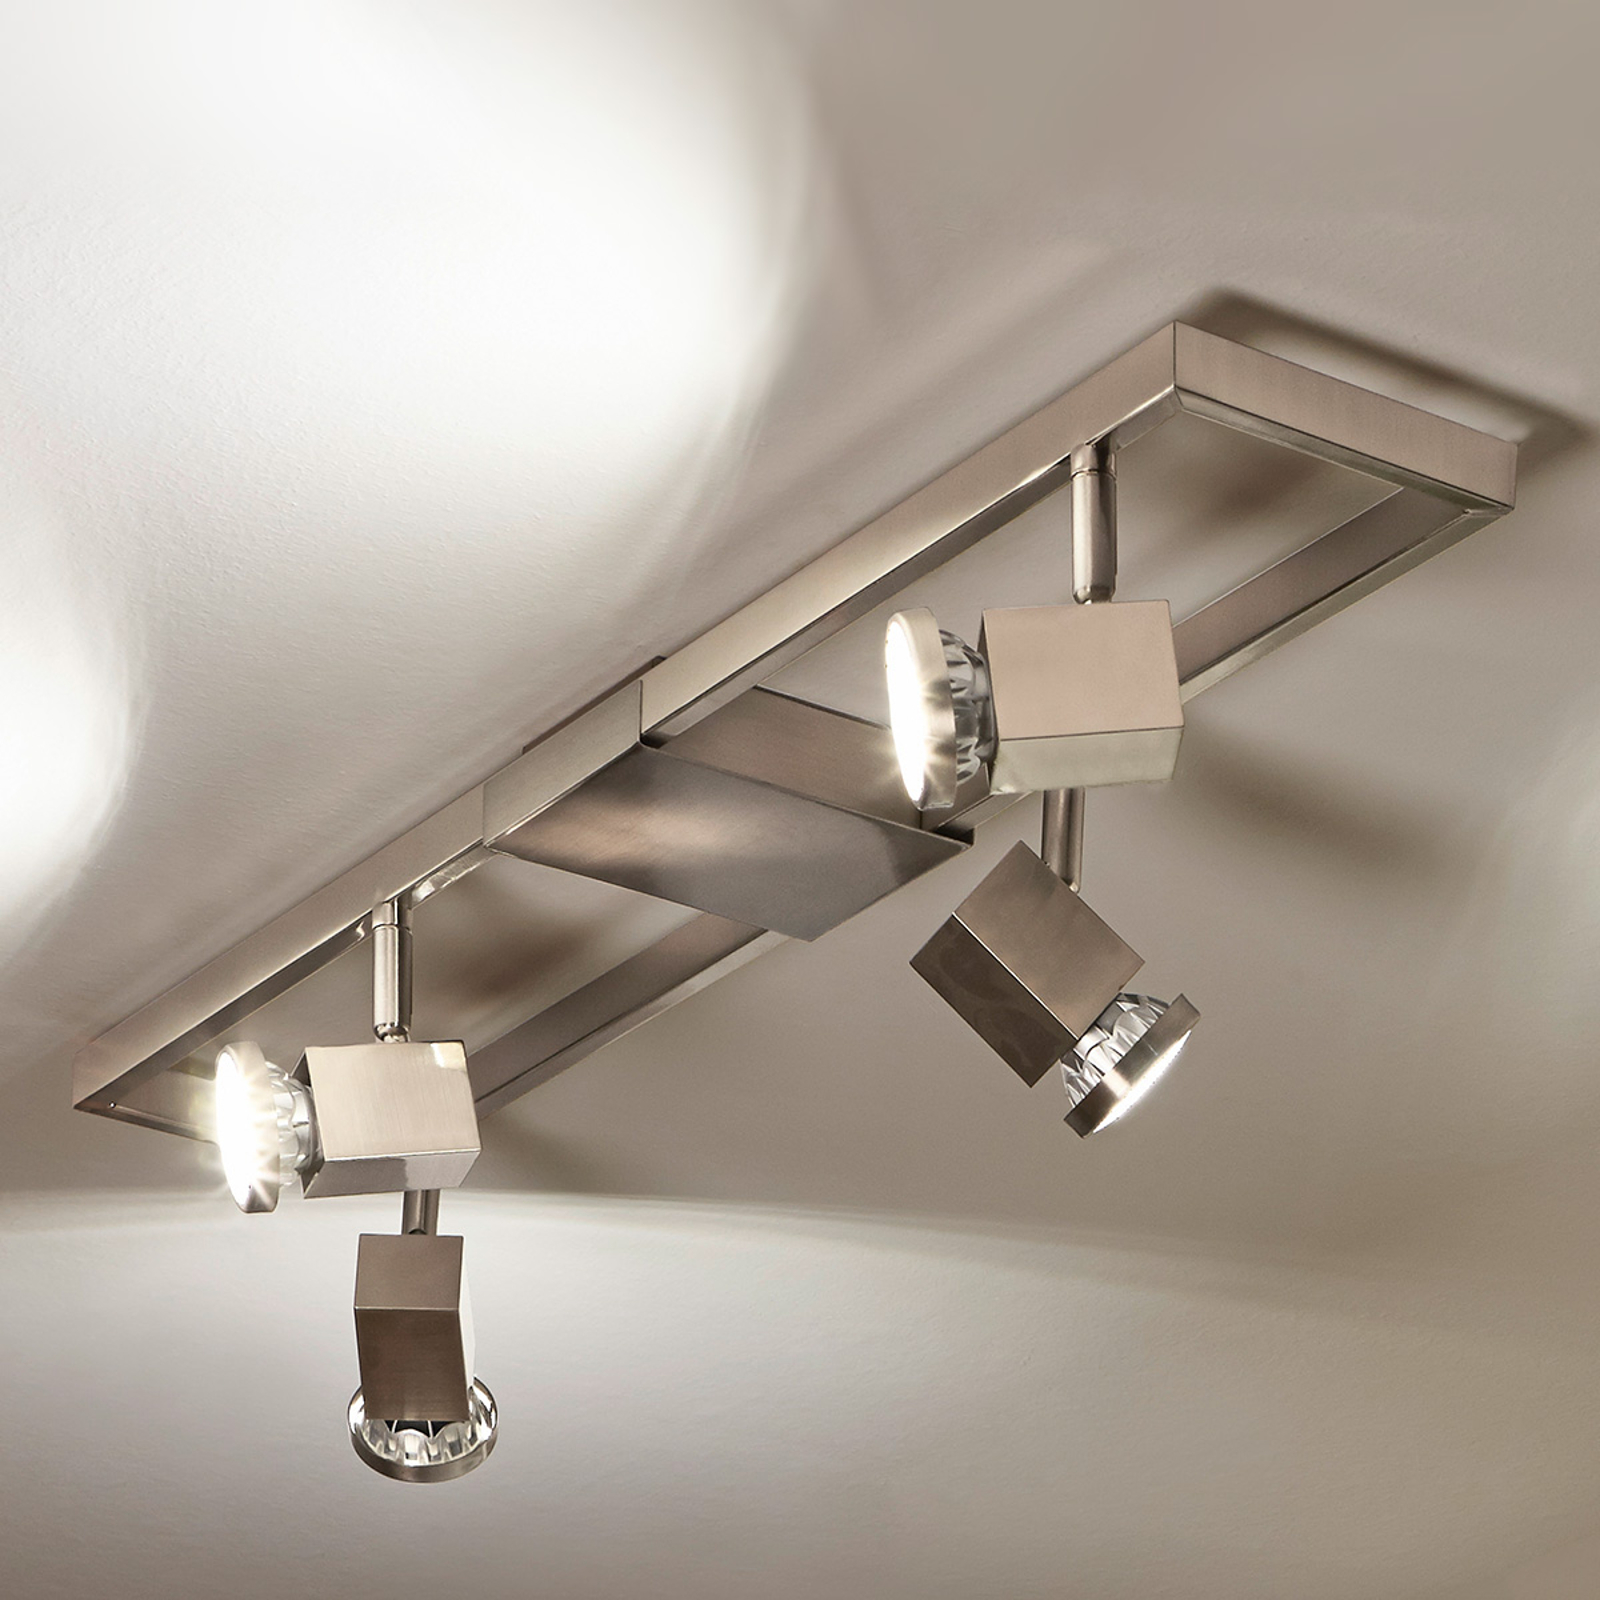 Vierflammiger LED-Deckenstrahler Zeraco